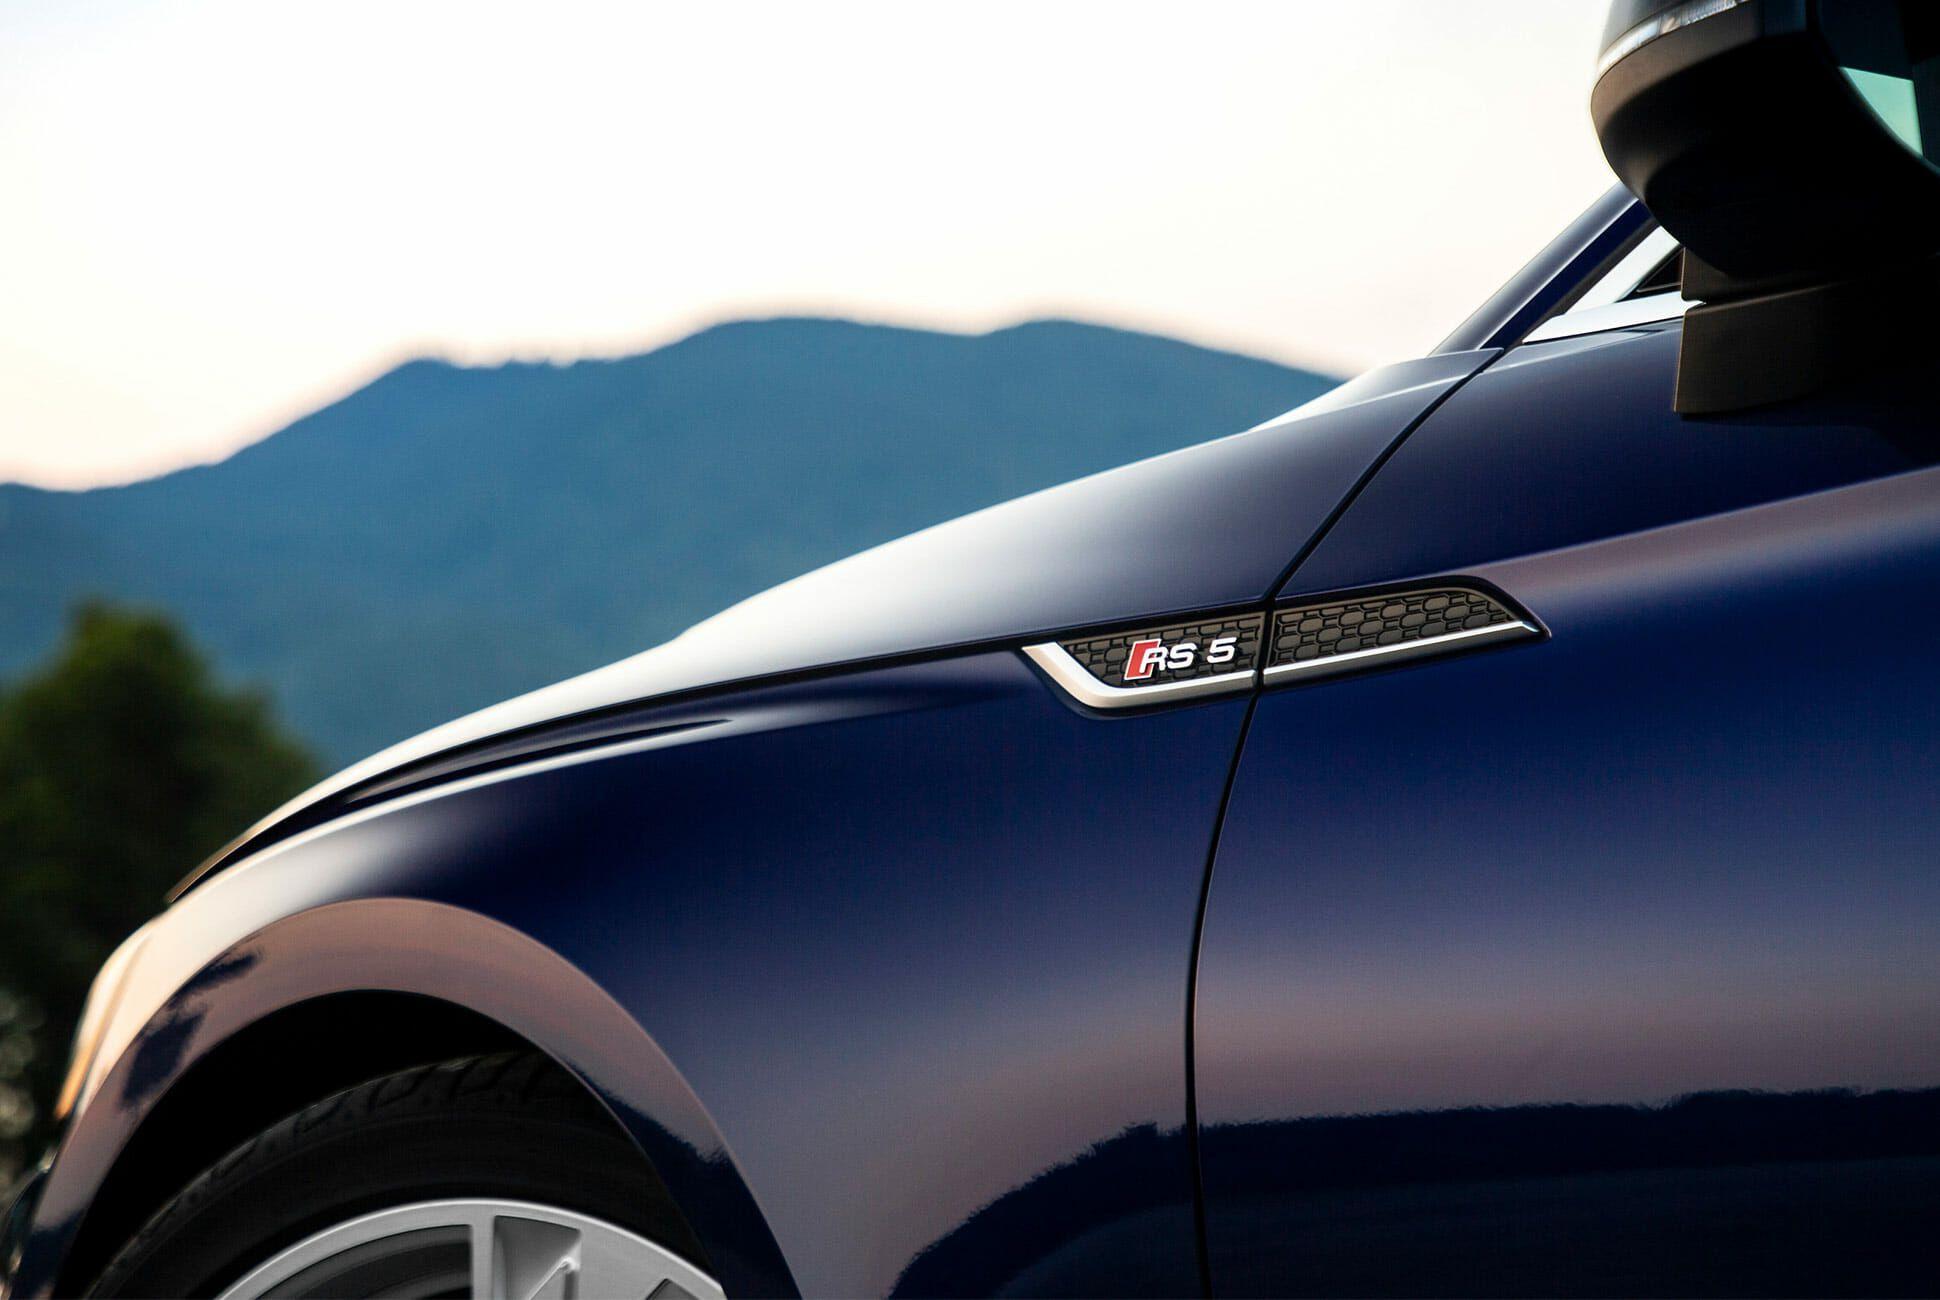 Audi-RS5-Sportback-Review-gear-patrol-slide-7